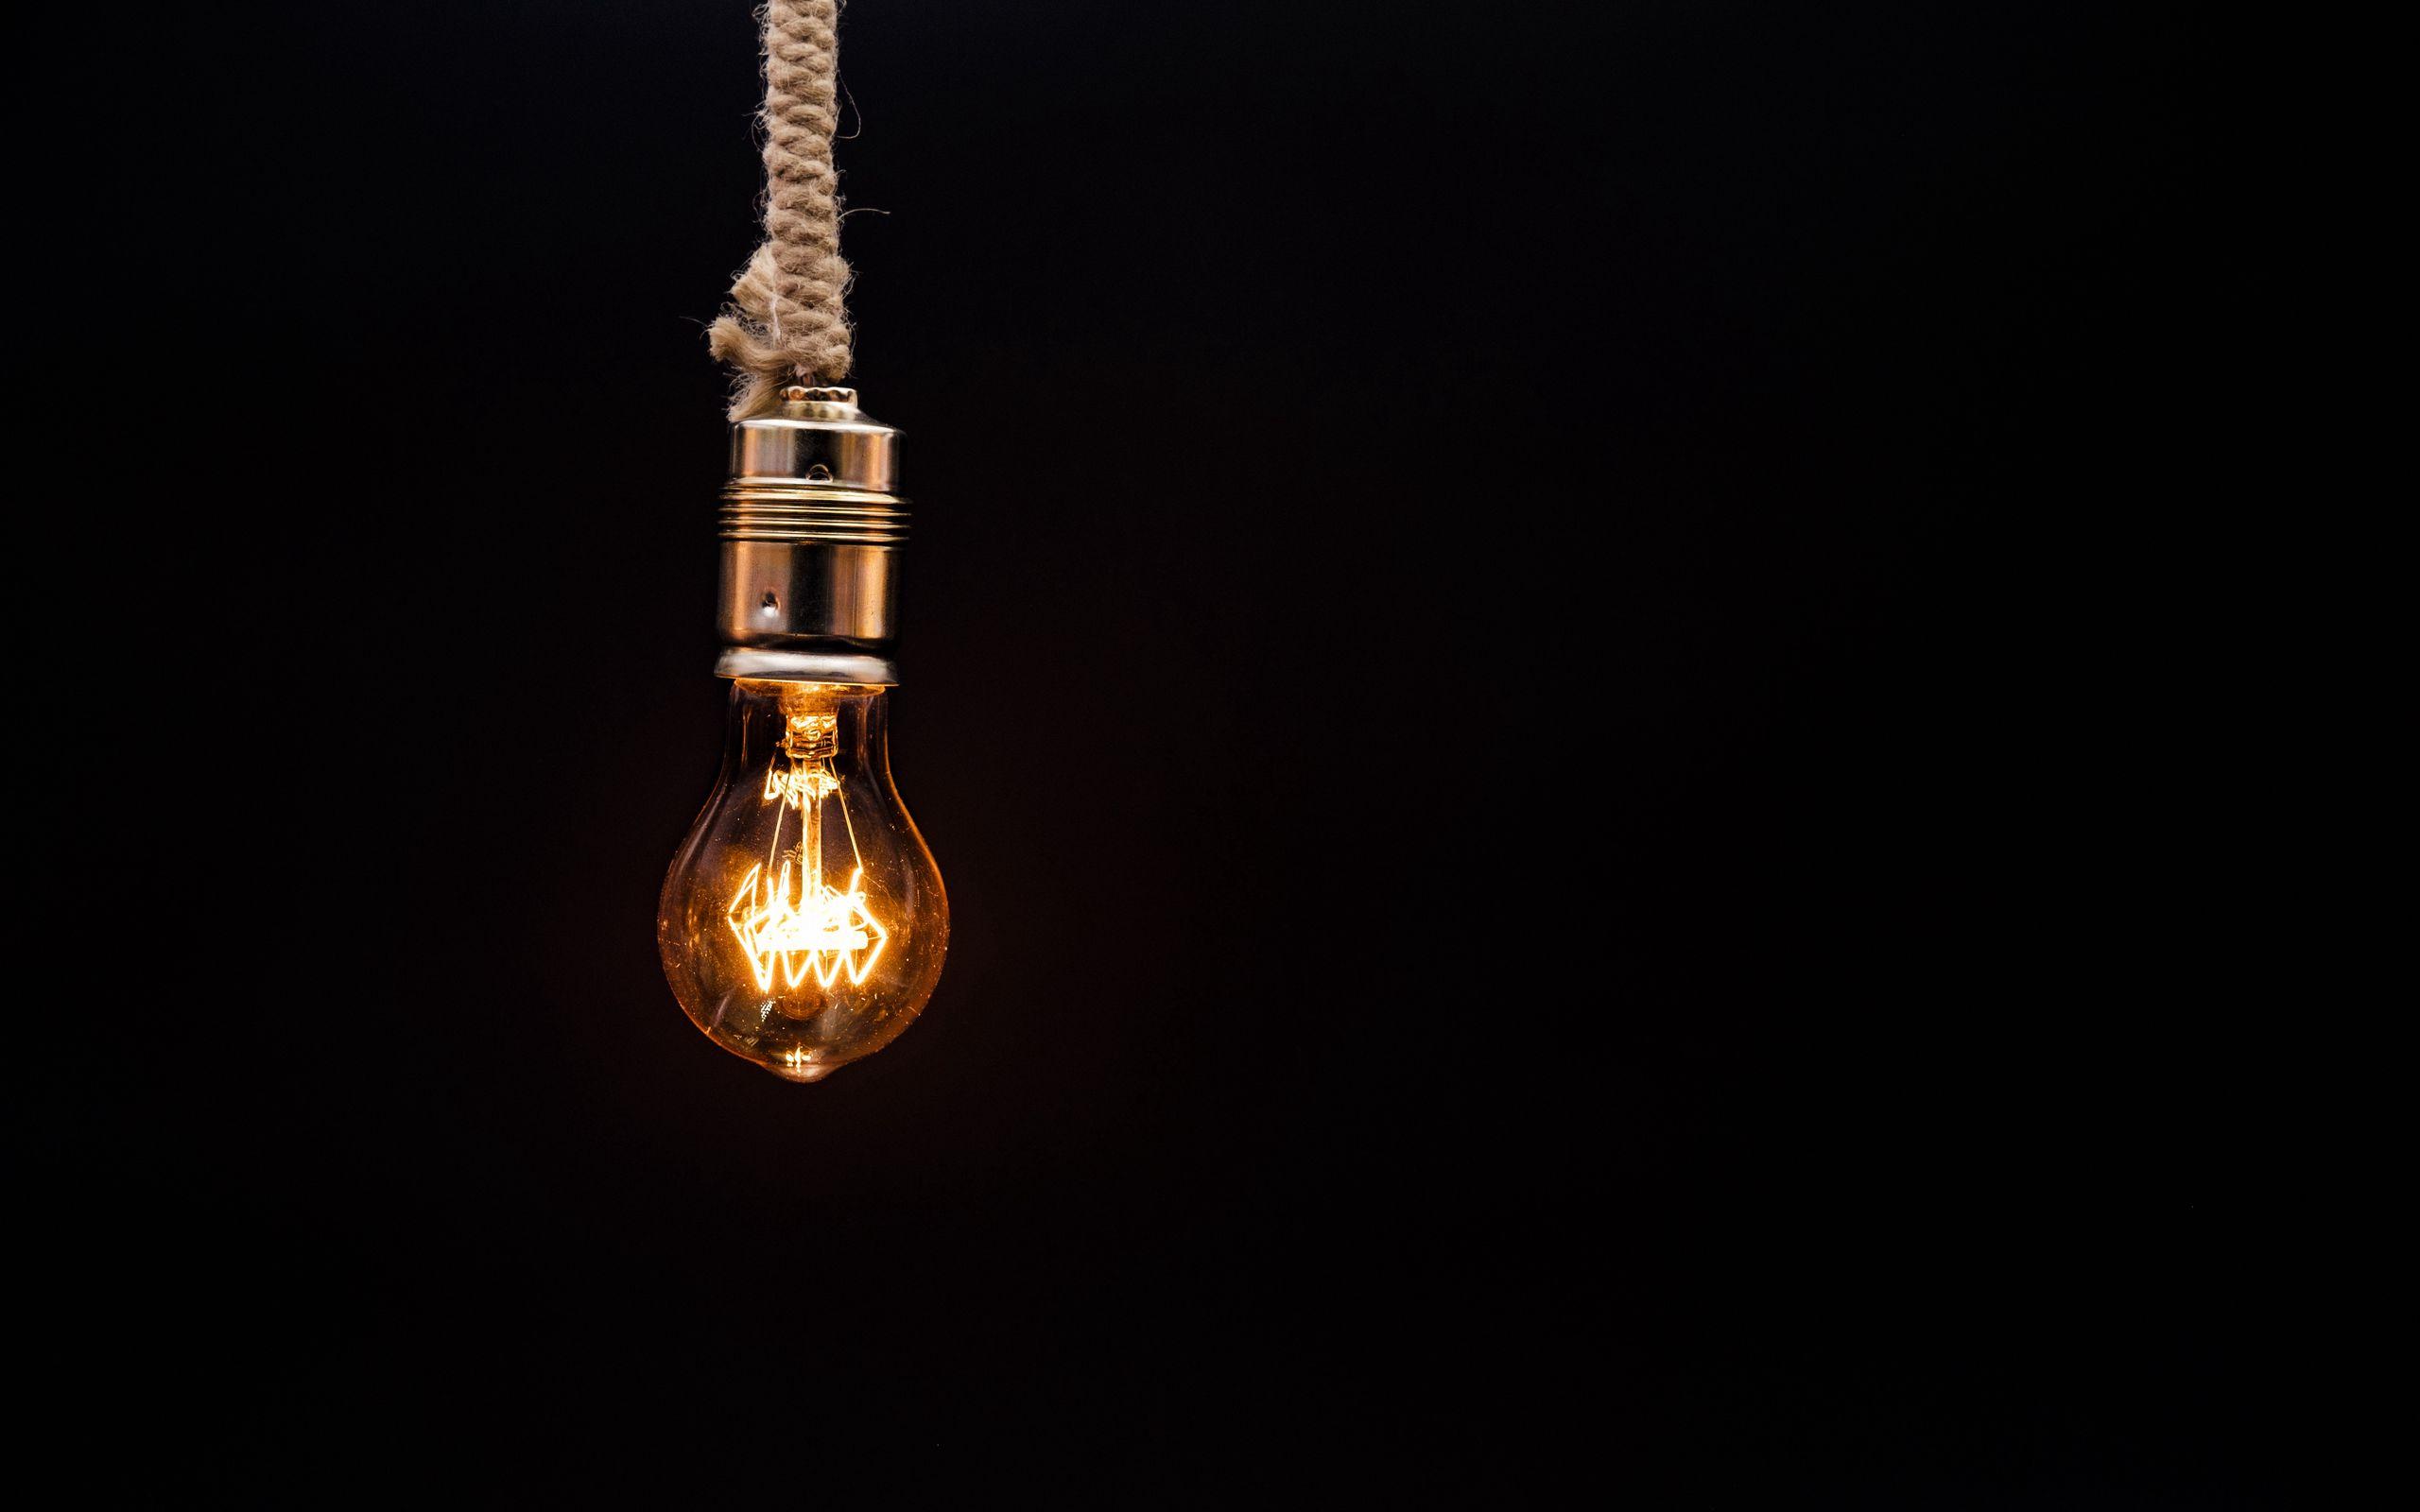 2560x1600 Wallpaper bulb, lighting, rope, electricity, edisons lamp